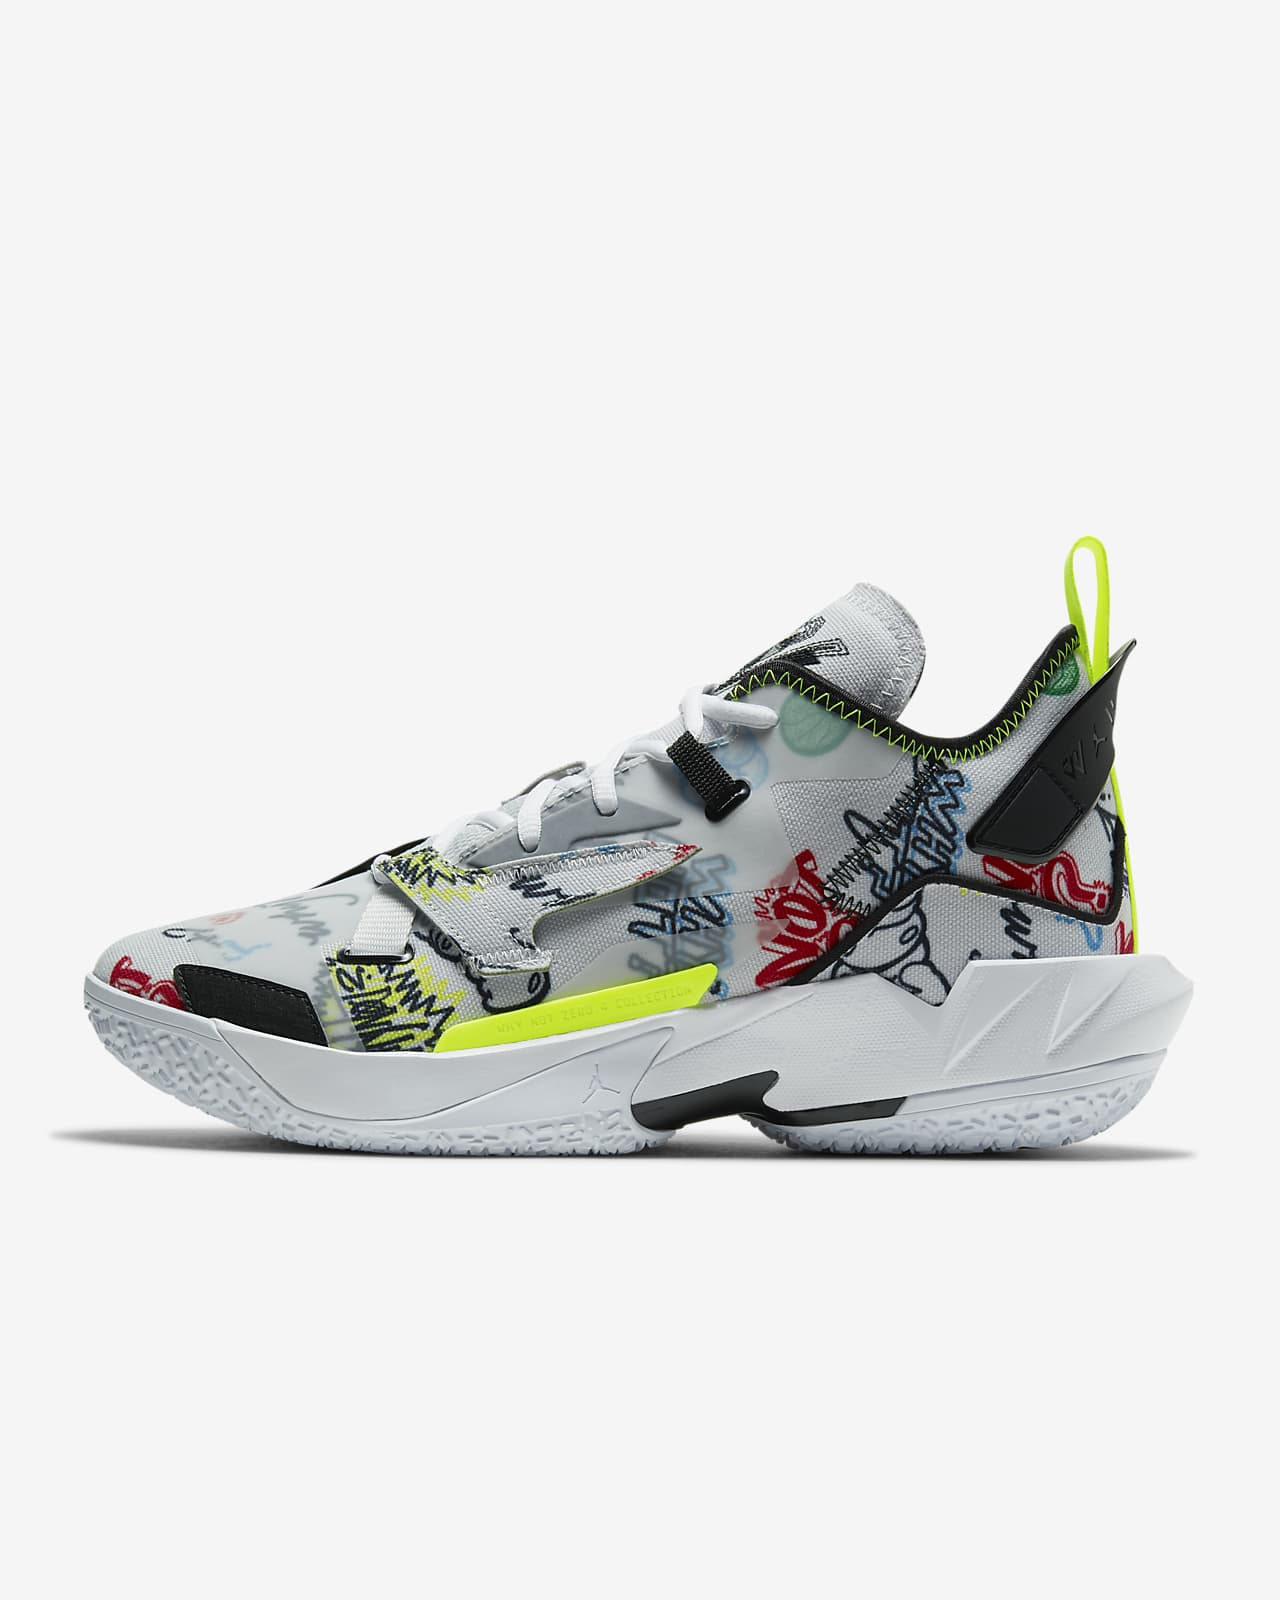 Jordan Why Not Zer0.4 PF 男子篮球鞋 男子篮球鞋